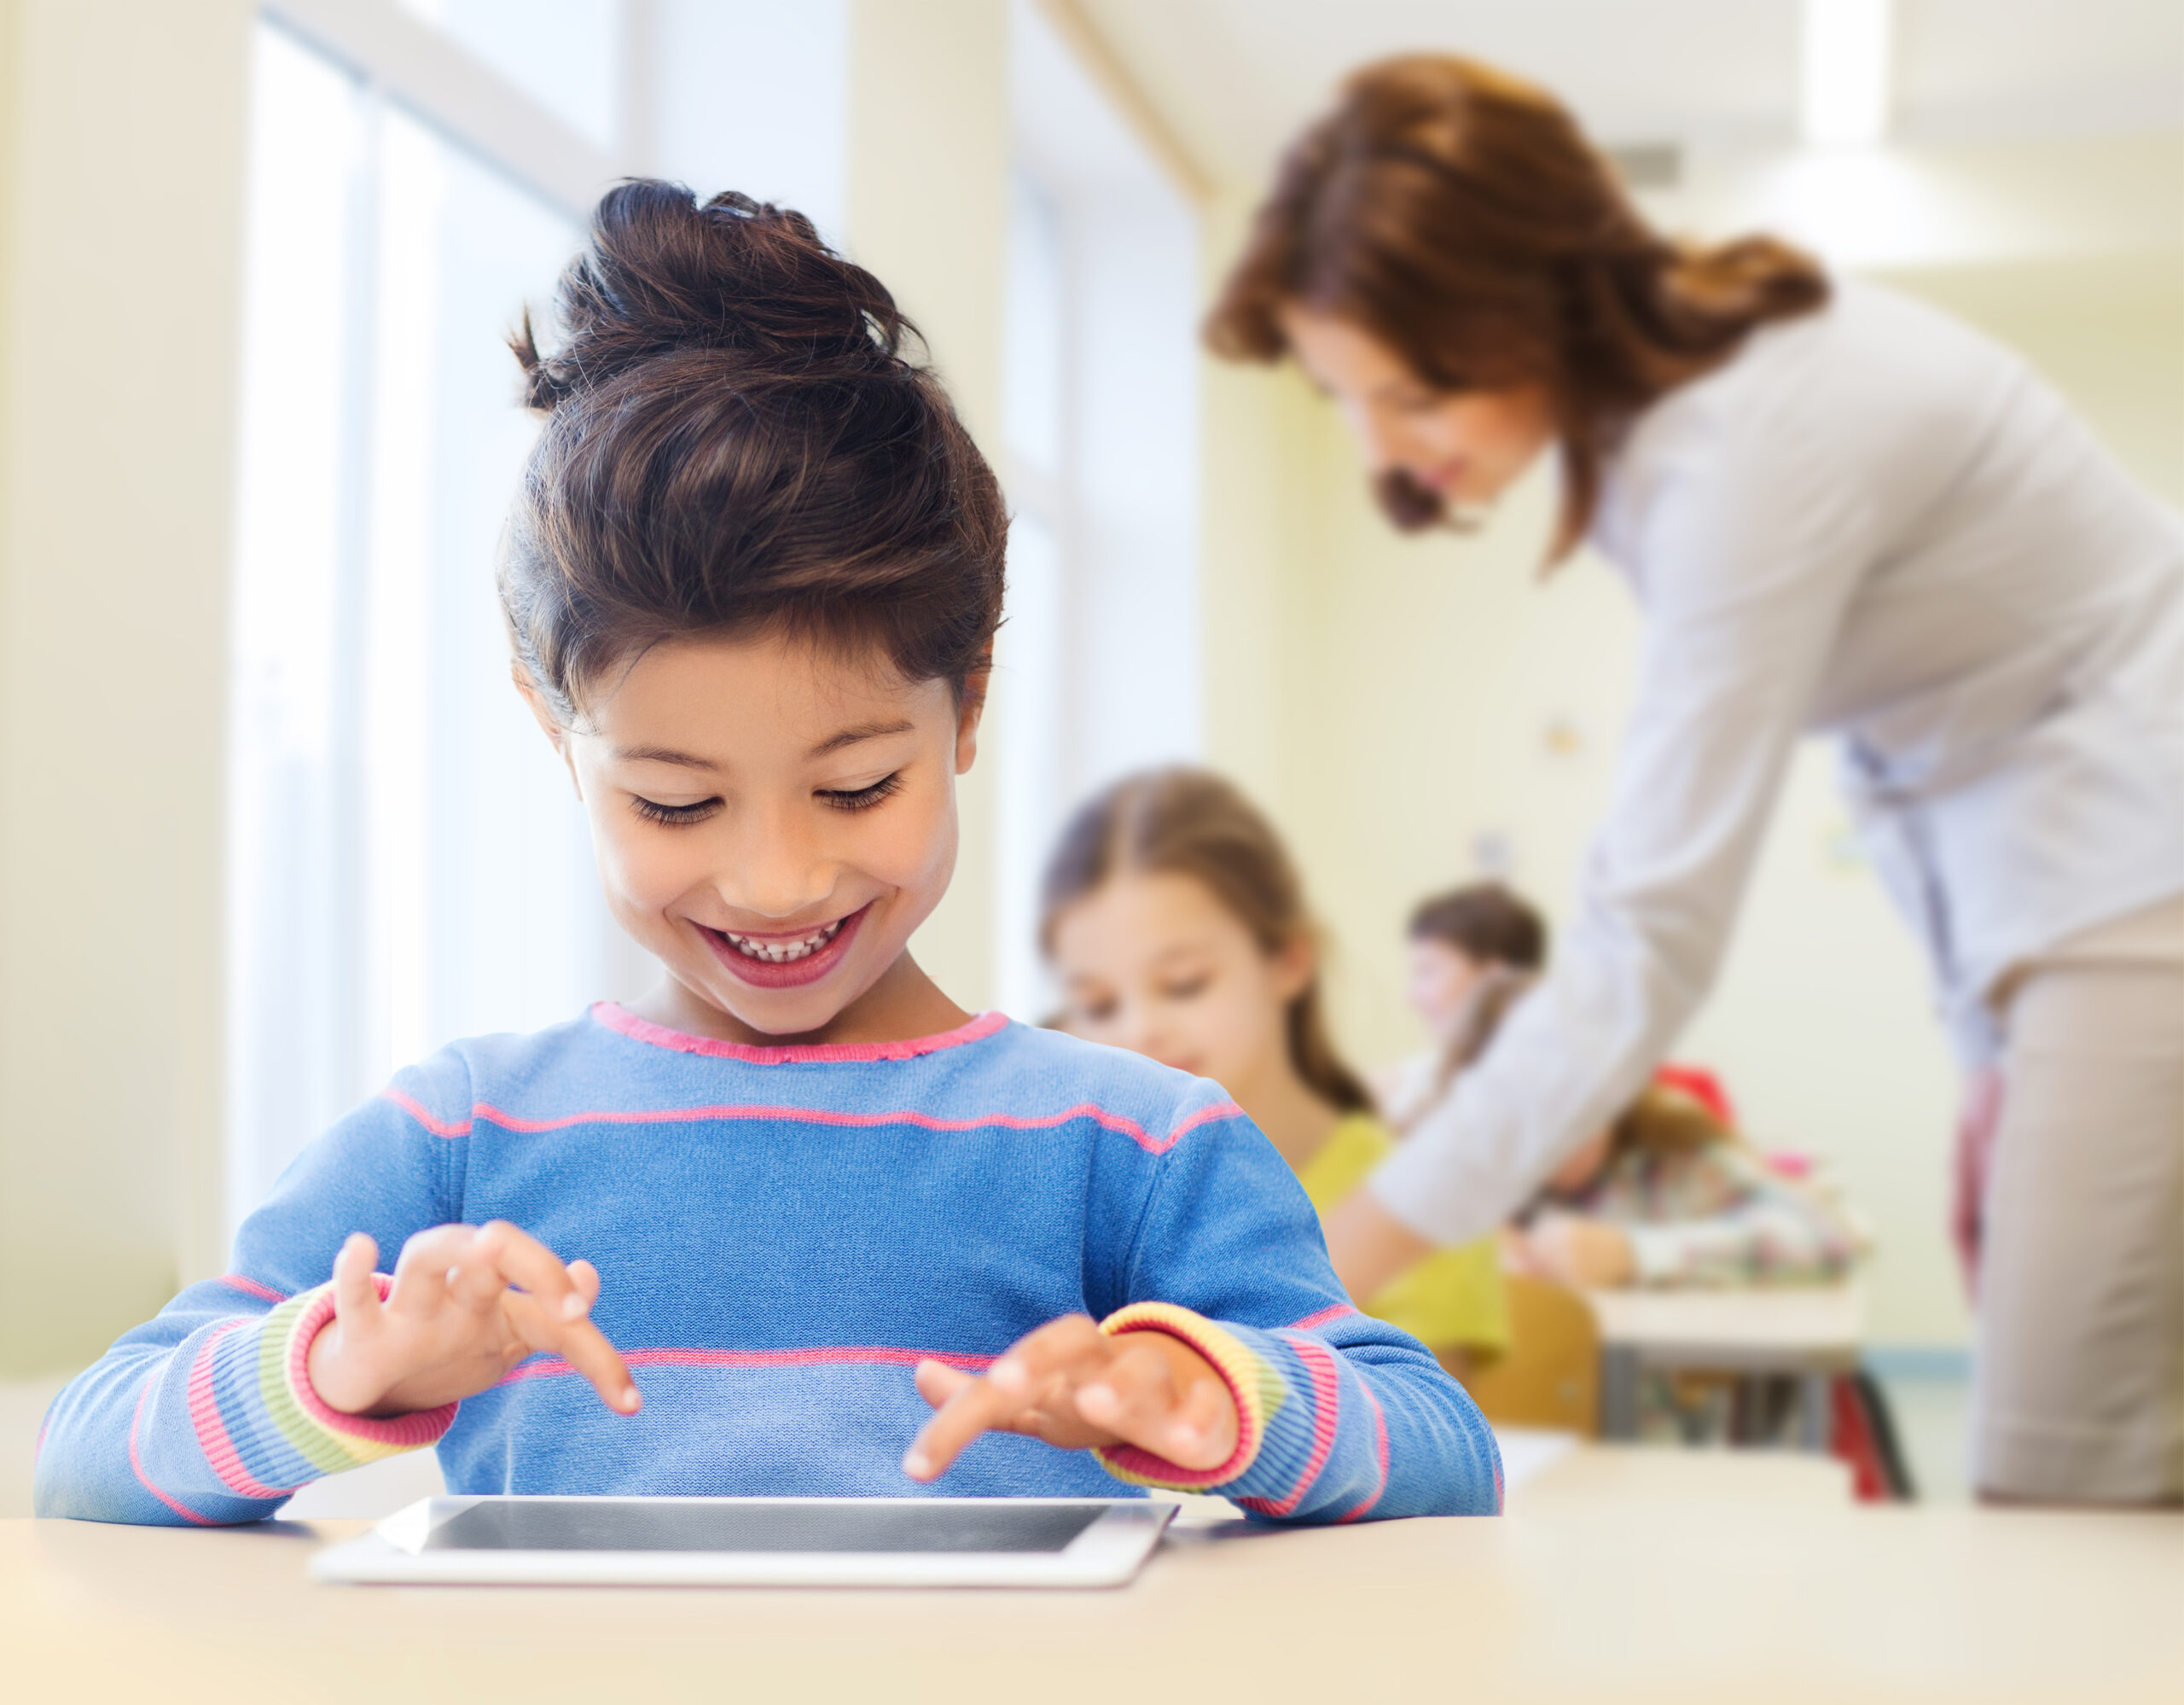 Schülerin am Tablet-PC. Foto: Colourbox.